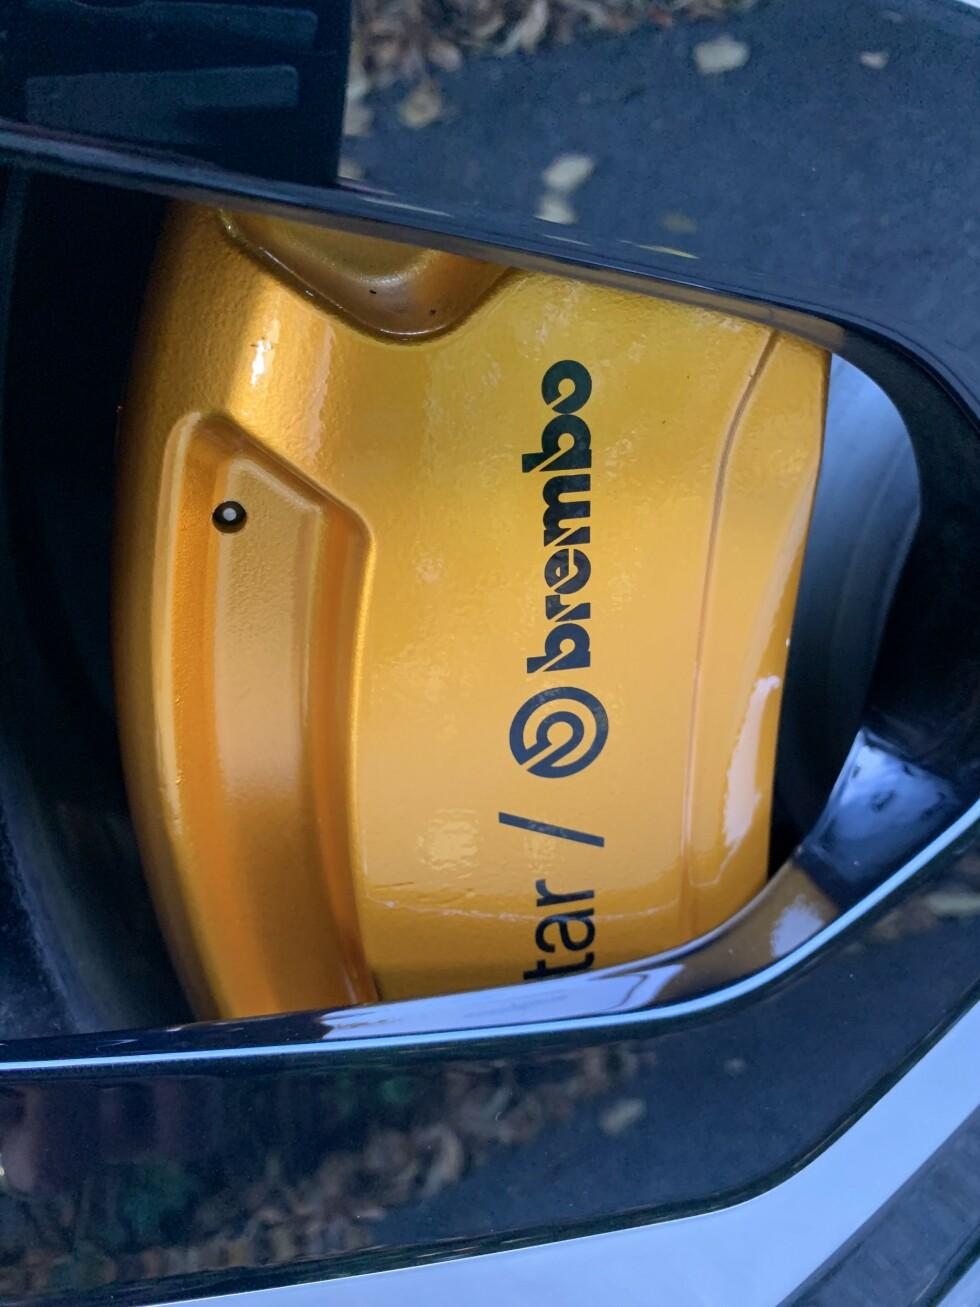 <strong>PERFORMANCE-DETALJER:</strong> Bremsekalippere fra italienske Brembo. Foto: Øystein B. Fossum